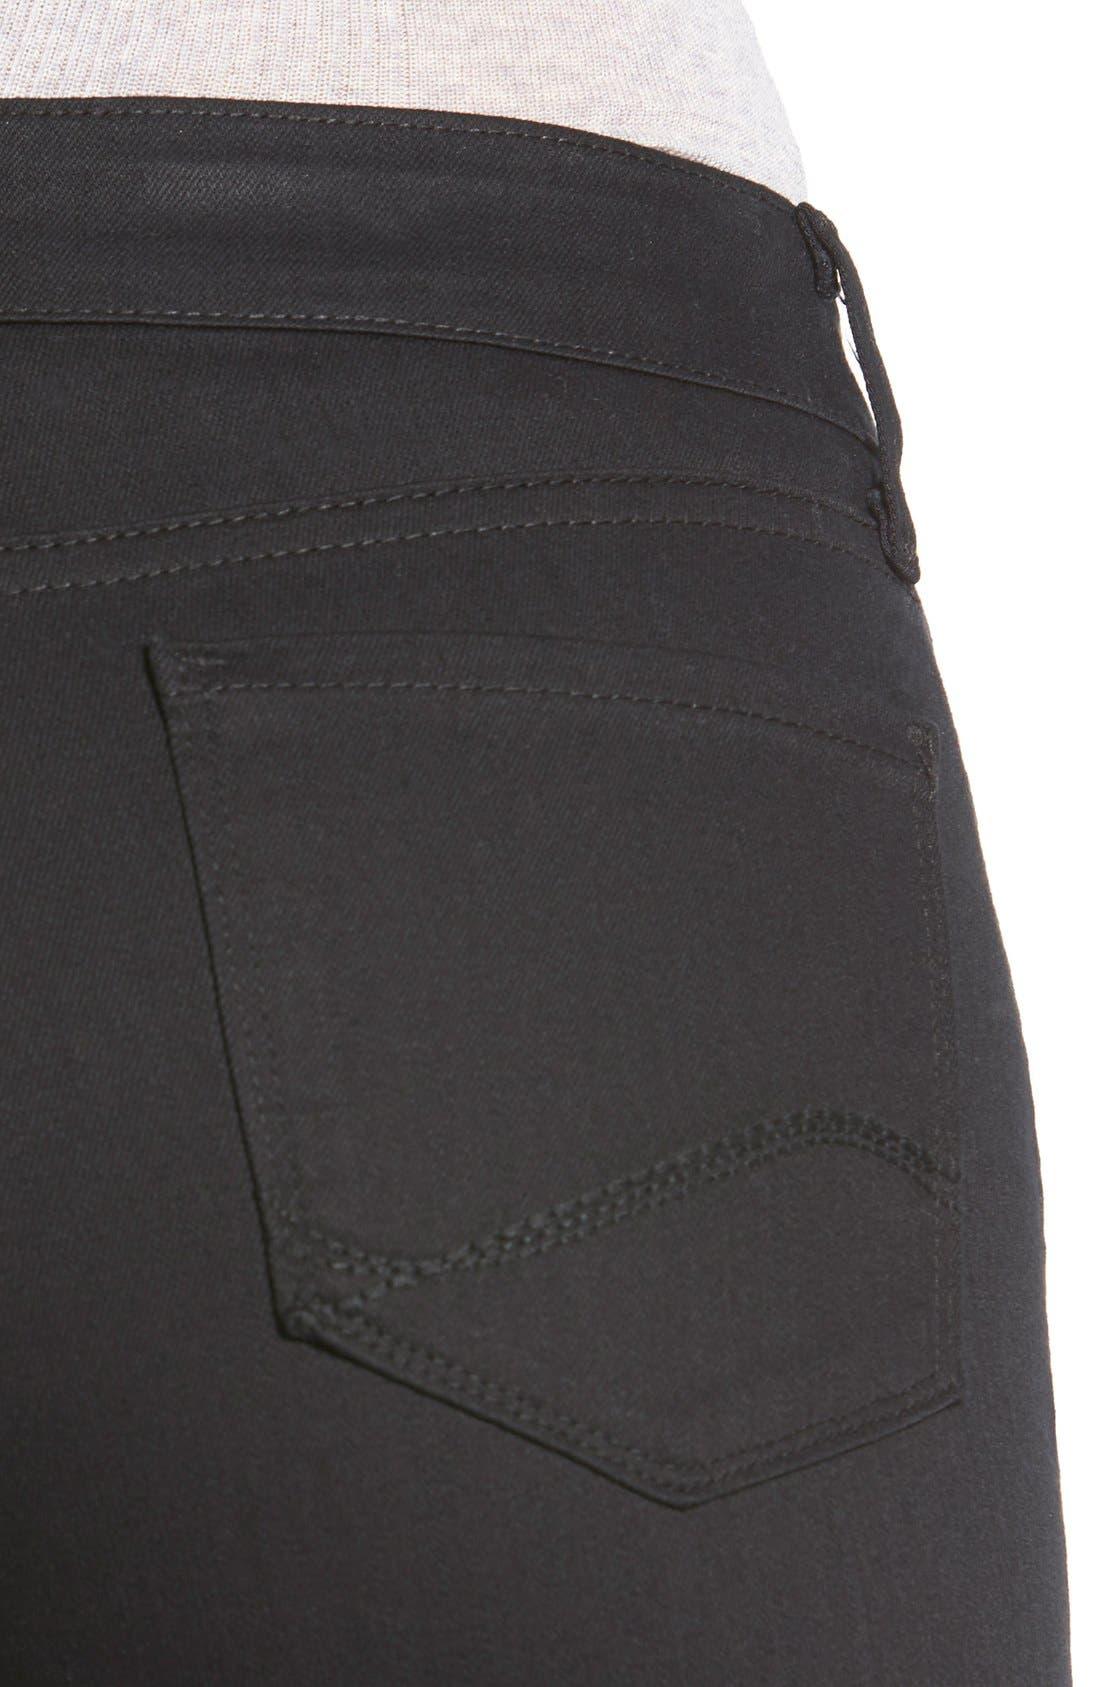 'Samantha' Stretch Slim Straight Leg Jeans,                             Alternate thumbnail 2, color,                             001